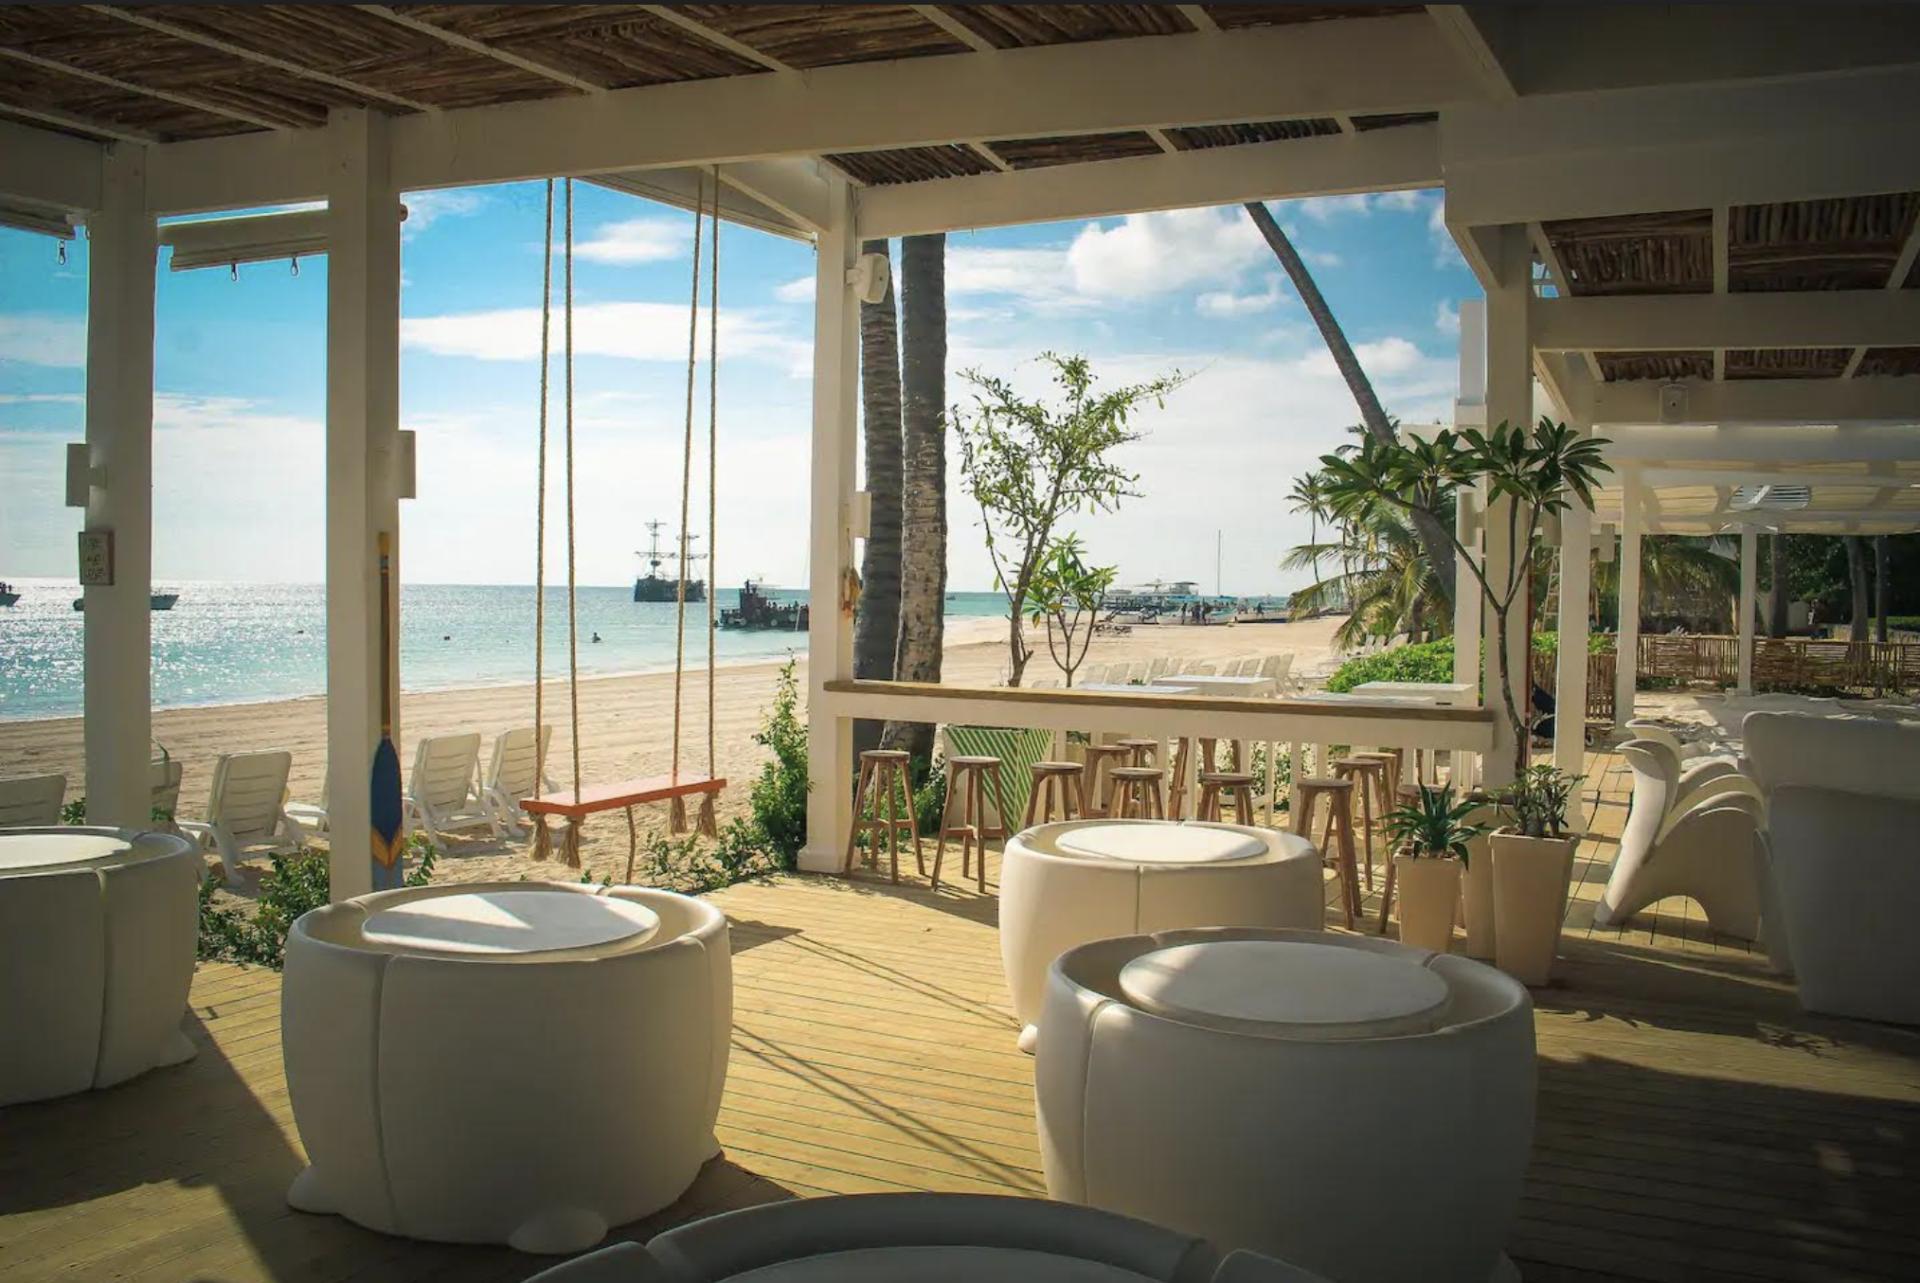 Beach property - Property beach - beach condo dghytjyt8